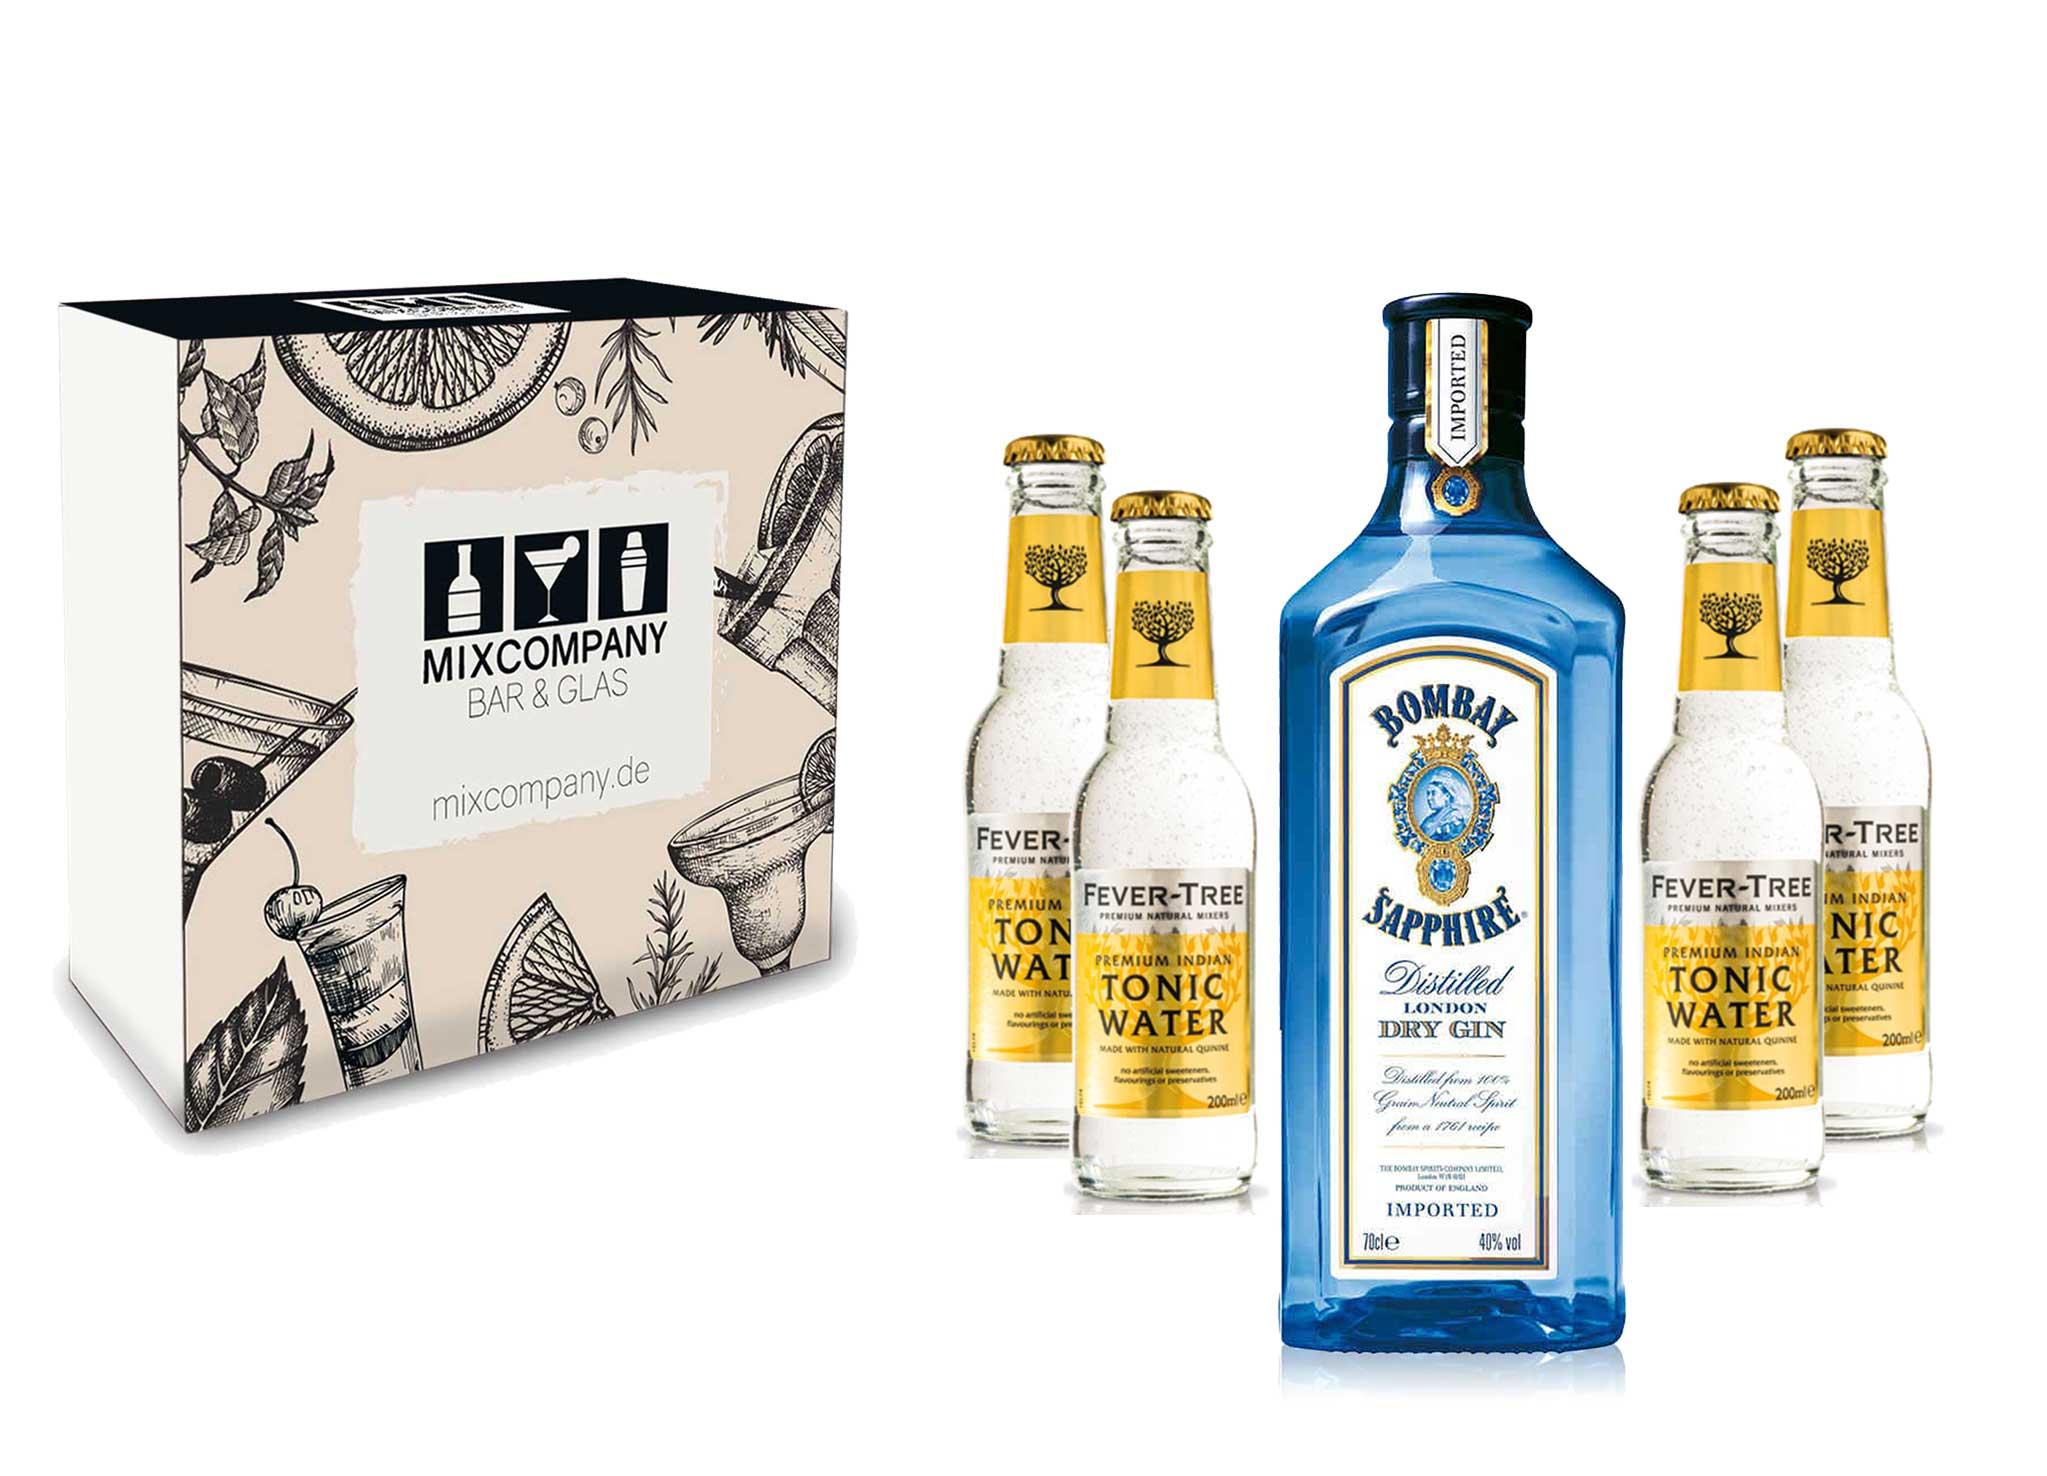 Gin Tonic Giftbox Geschenkset - Bombay Sapphire 0,7l 700ml (40% Vol) + 4x Fever Tree Tonic Water 200ml inkl. Pfand MEHRWEG + Geschenkverpackung